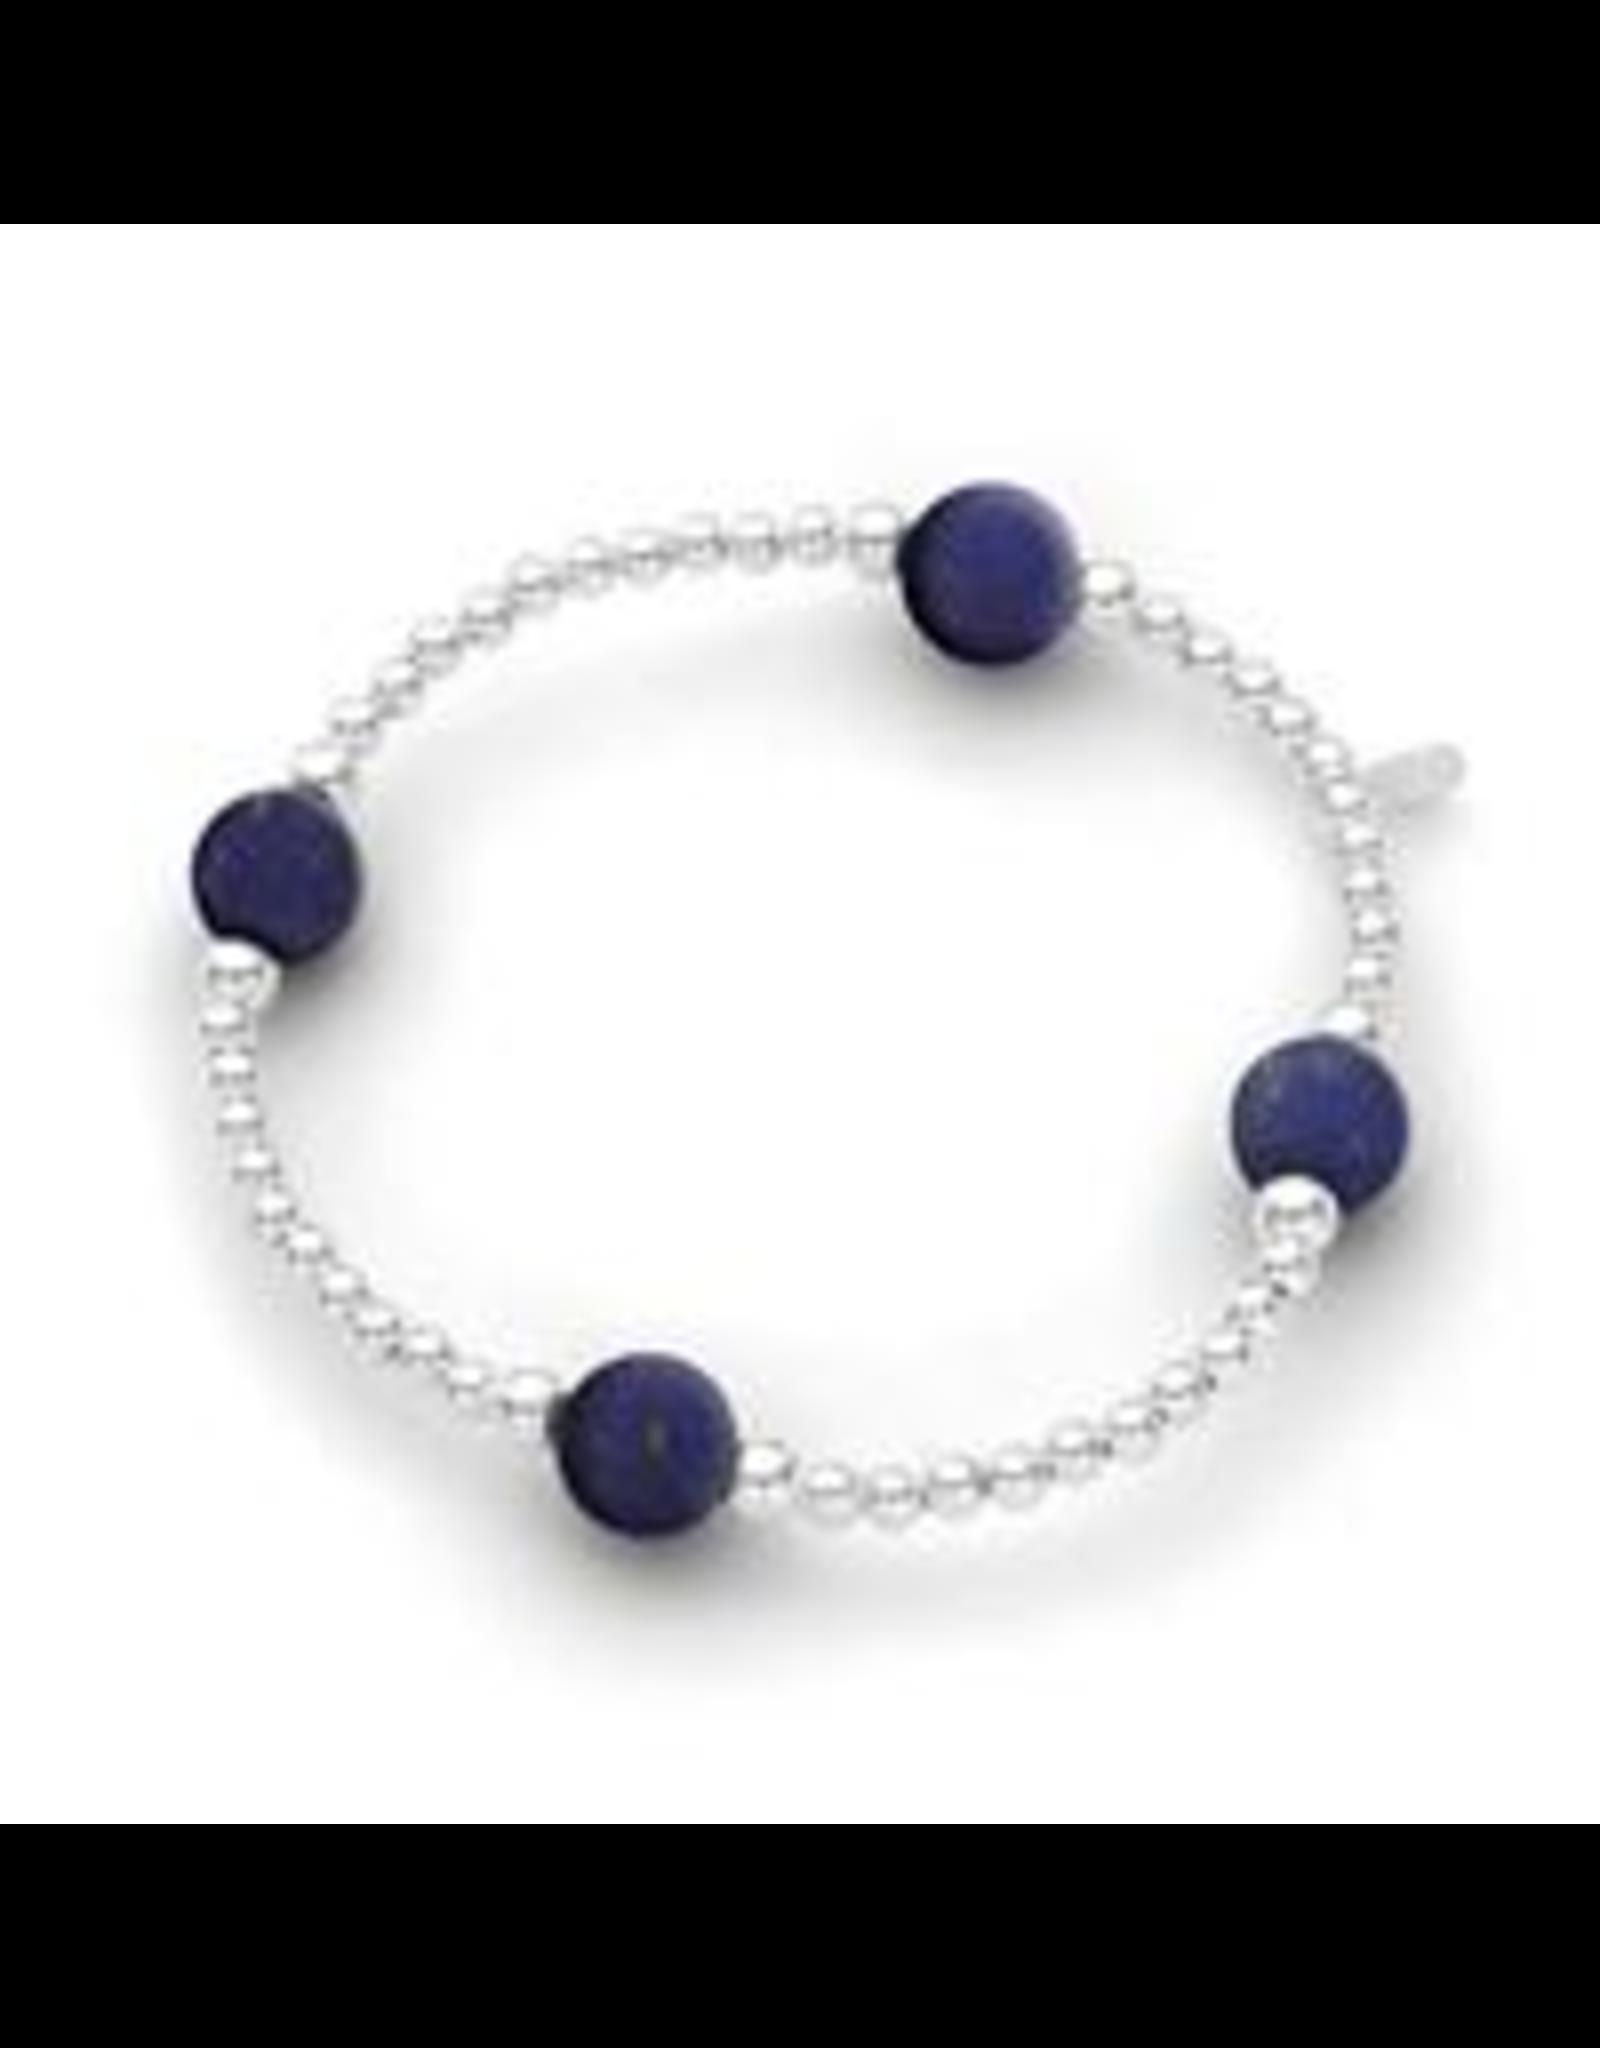 Stones & Silver Elastic Ball Bracelet with Lapis Lazuli